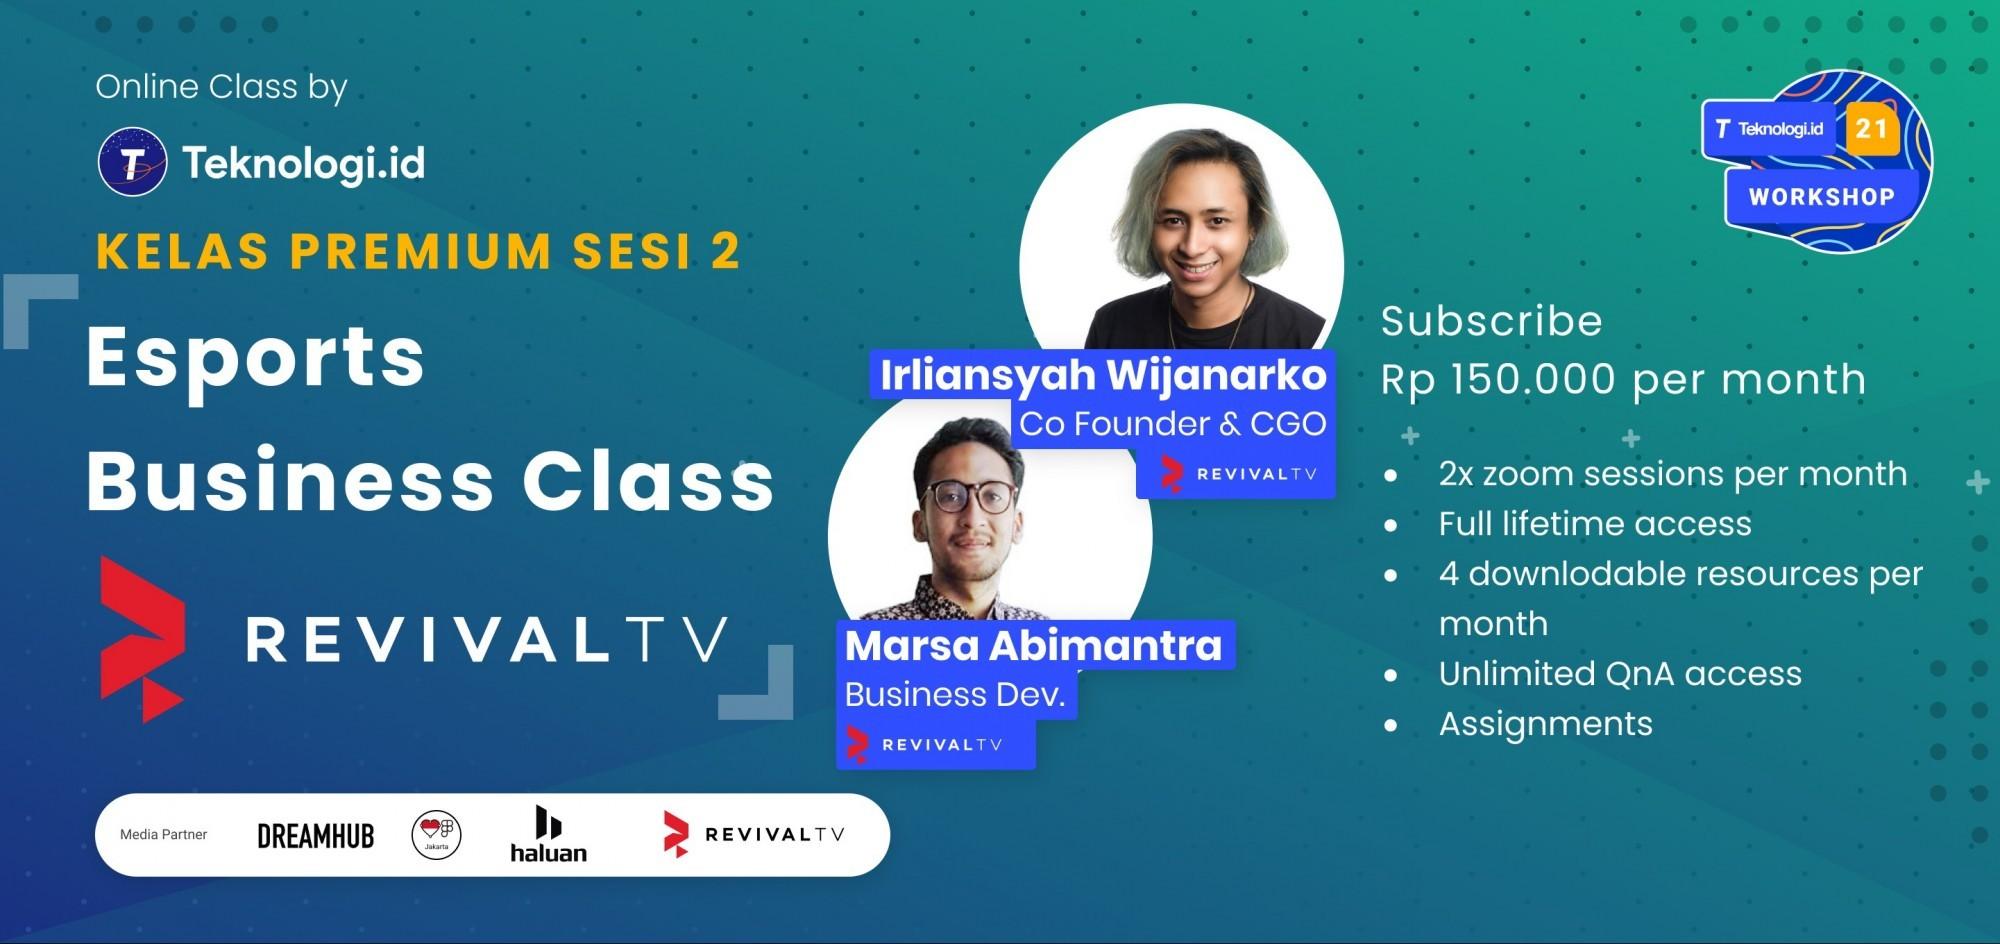 Kelas Online Premium - Esports Business Class with RevivaLTV (Sesi 2)